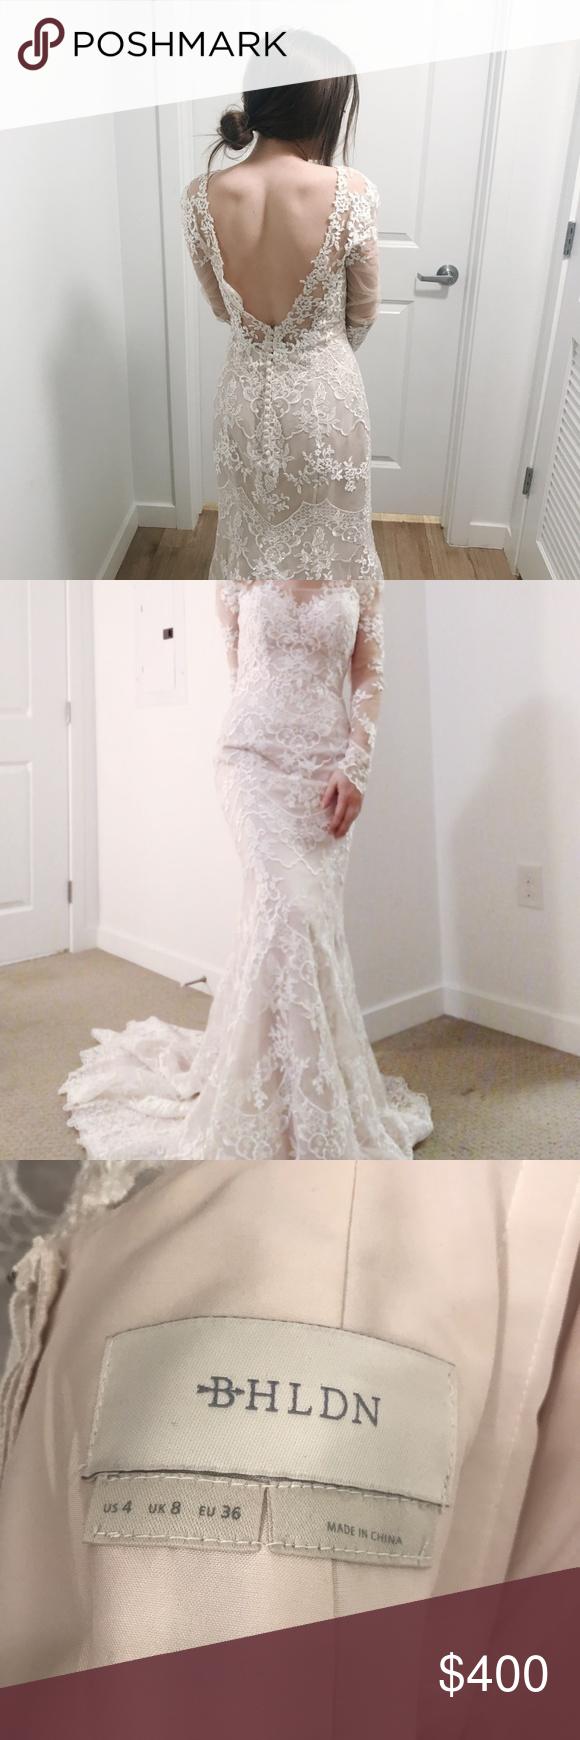 Bhldn Godfrey Gown Wedding Dress Anthropologie New Size 4 Long